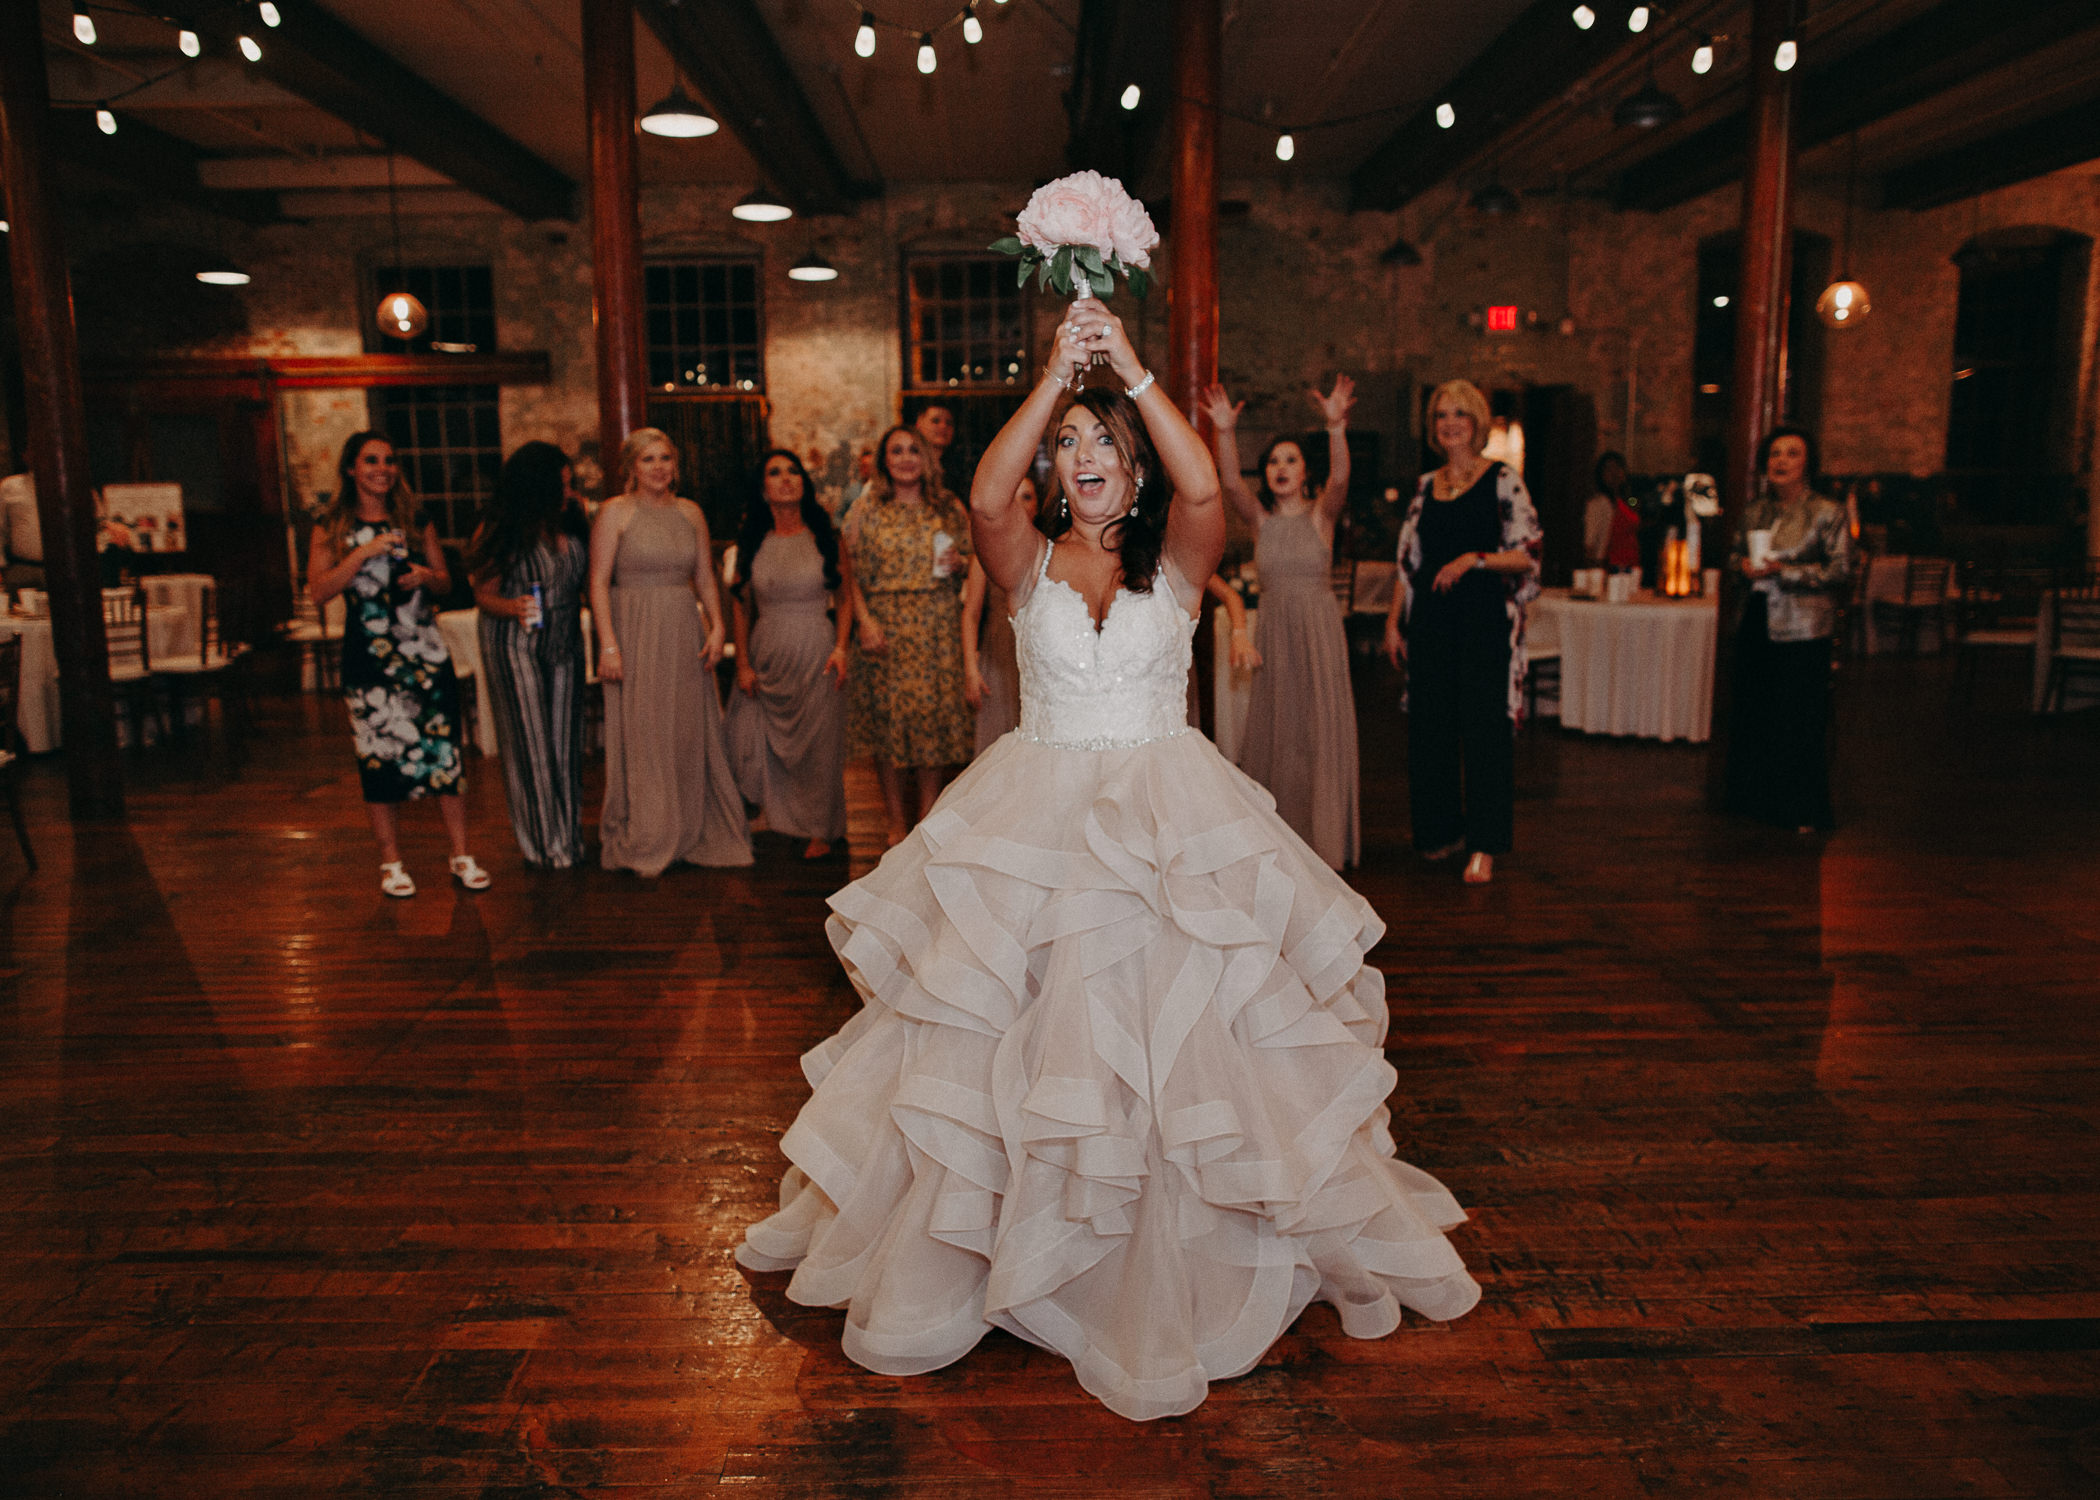 69 - Atlanta Wedding Photographer - The engine room - Ga - Wedding trends - Aline Marin Photography.jpg